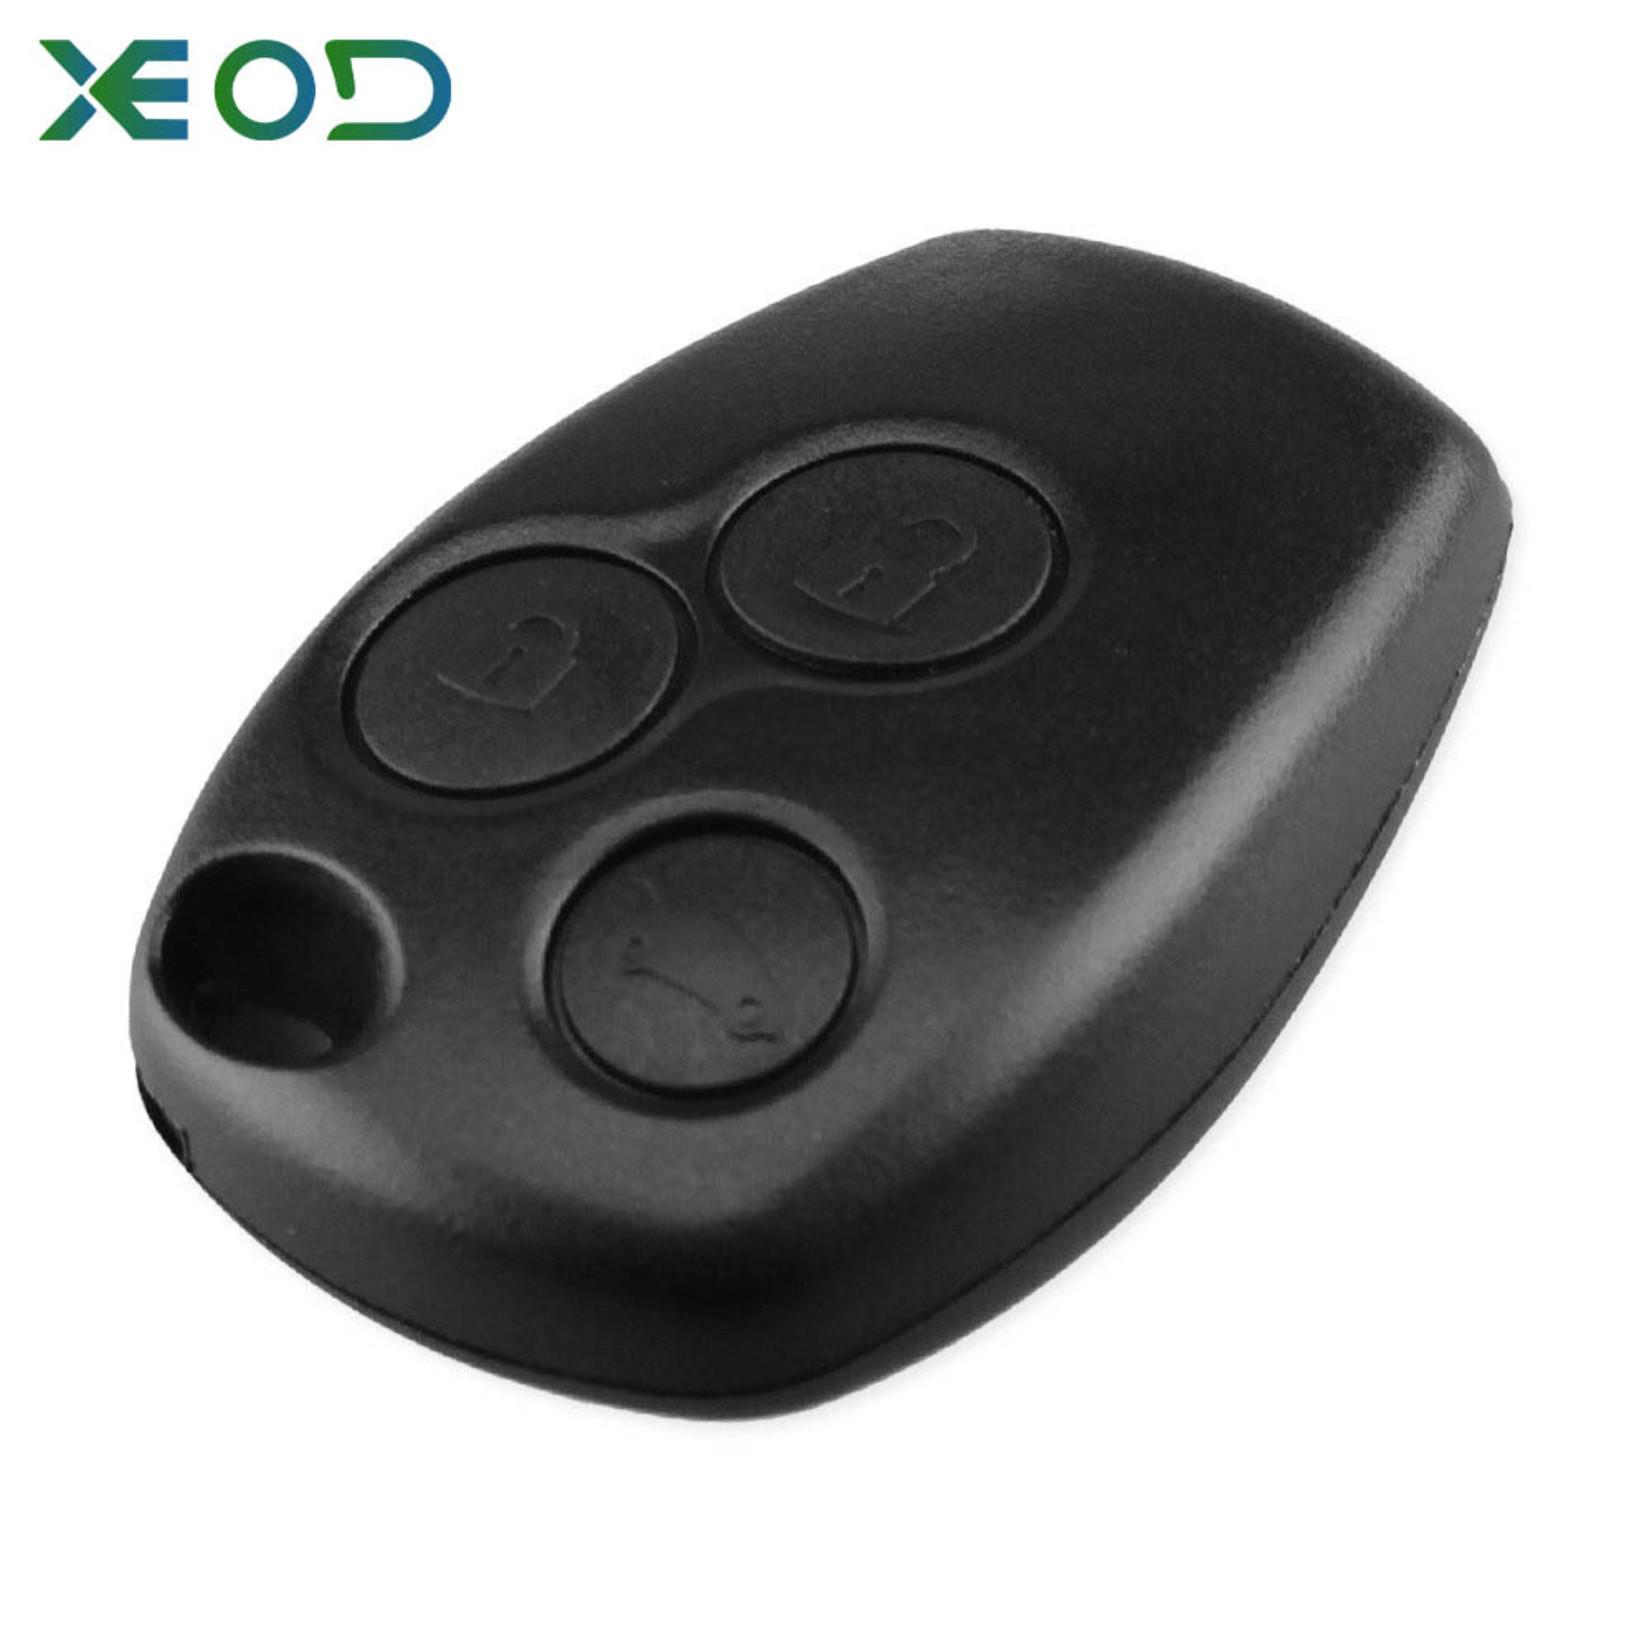 XEOD Dacia 3 knops sleutelbehuizing